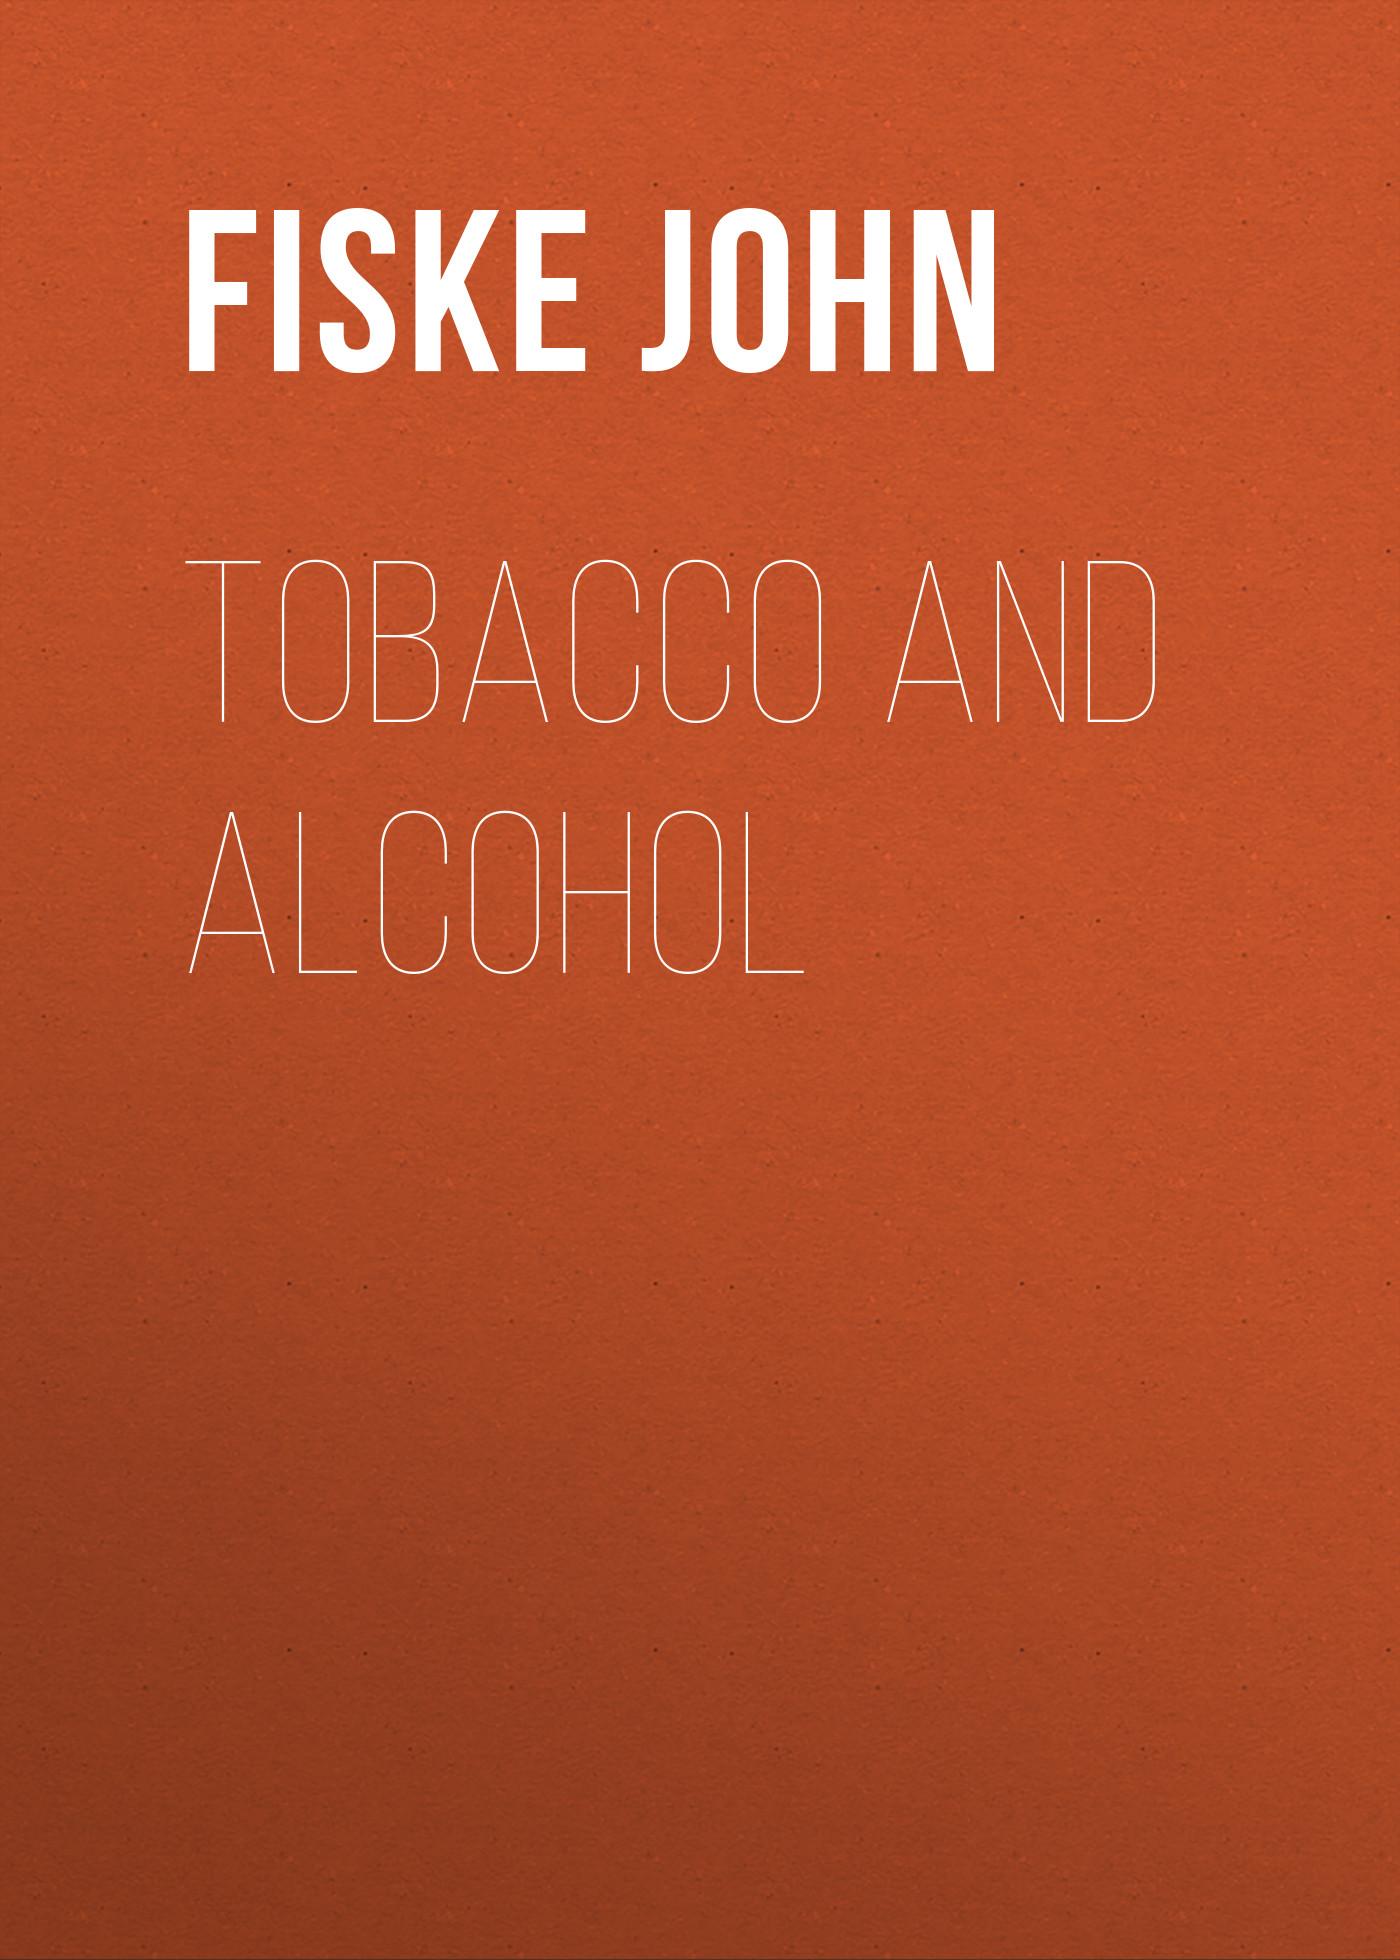 Fiske John Tobacco and Alcohol недорго, оригинальная цена